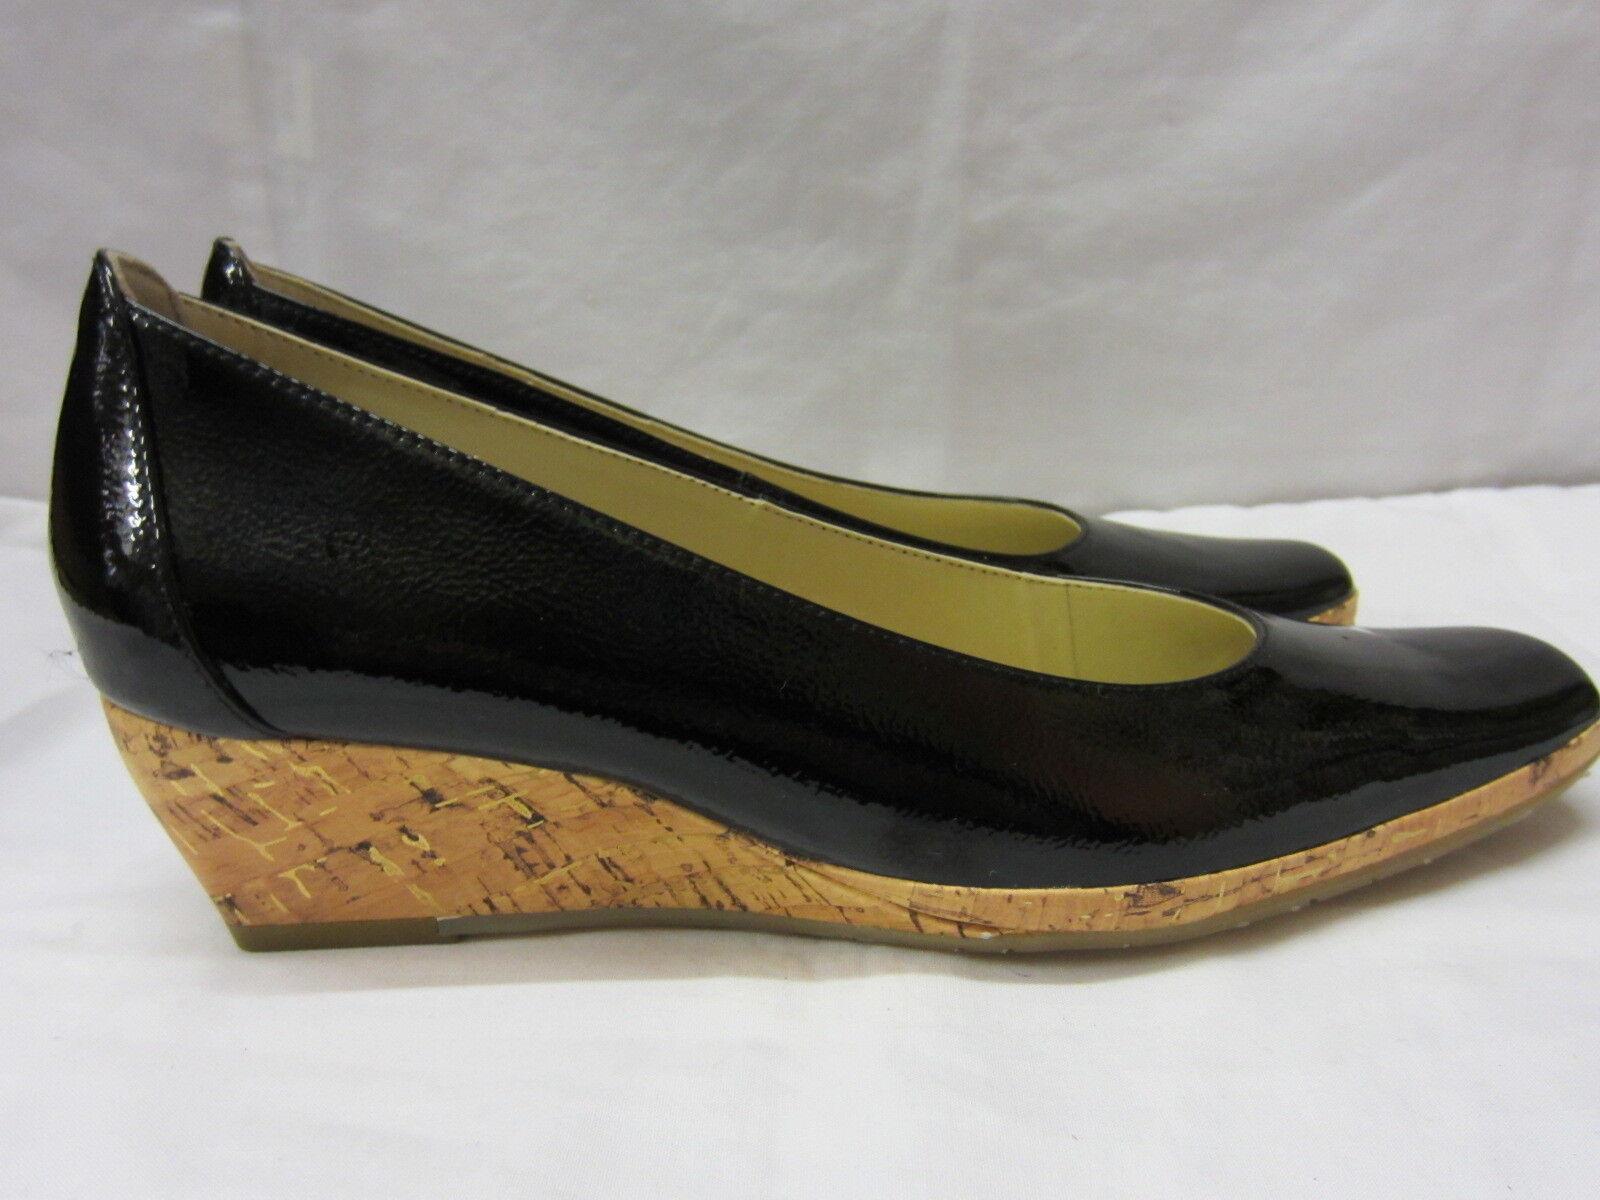 Damen Van Dal Keilabsatz D Schuhe schwarz Lackleder PALAWAN D Keilabsatz Einbau 41a168